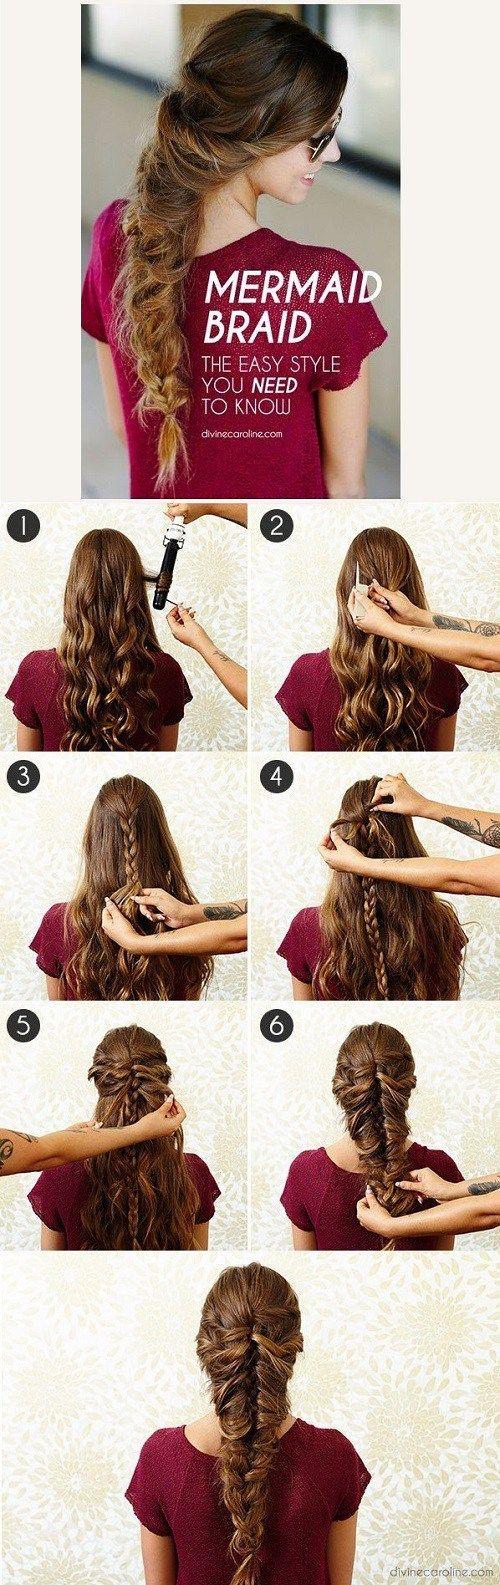 minutos y bello peinado trenzas pinterest tutorials hair